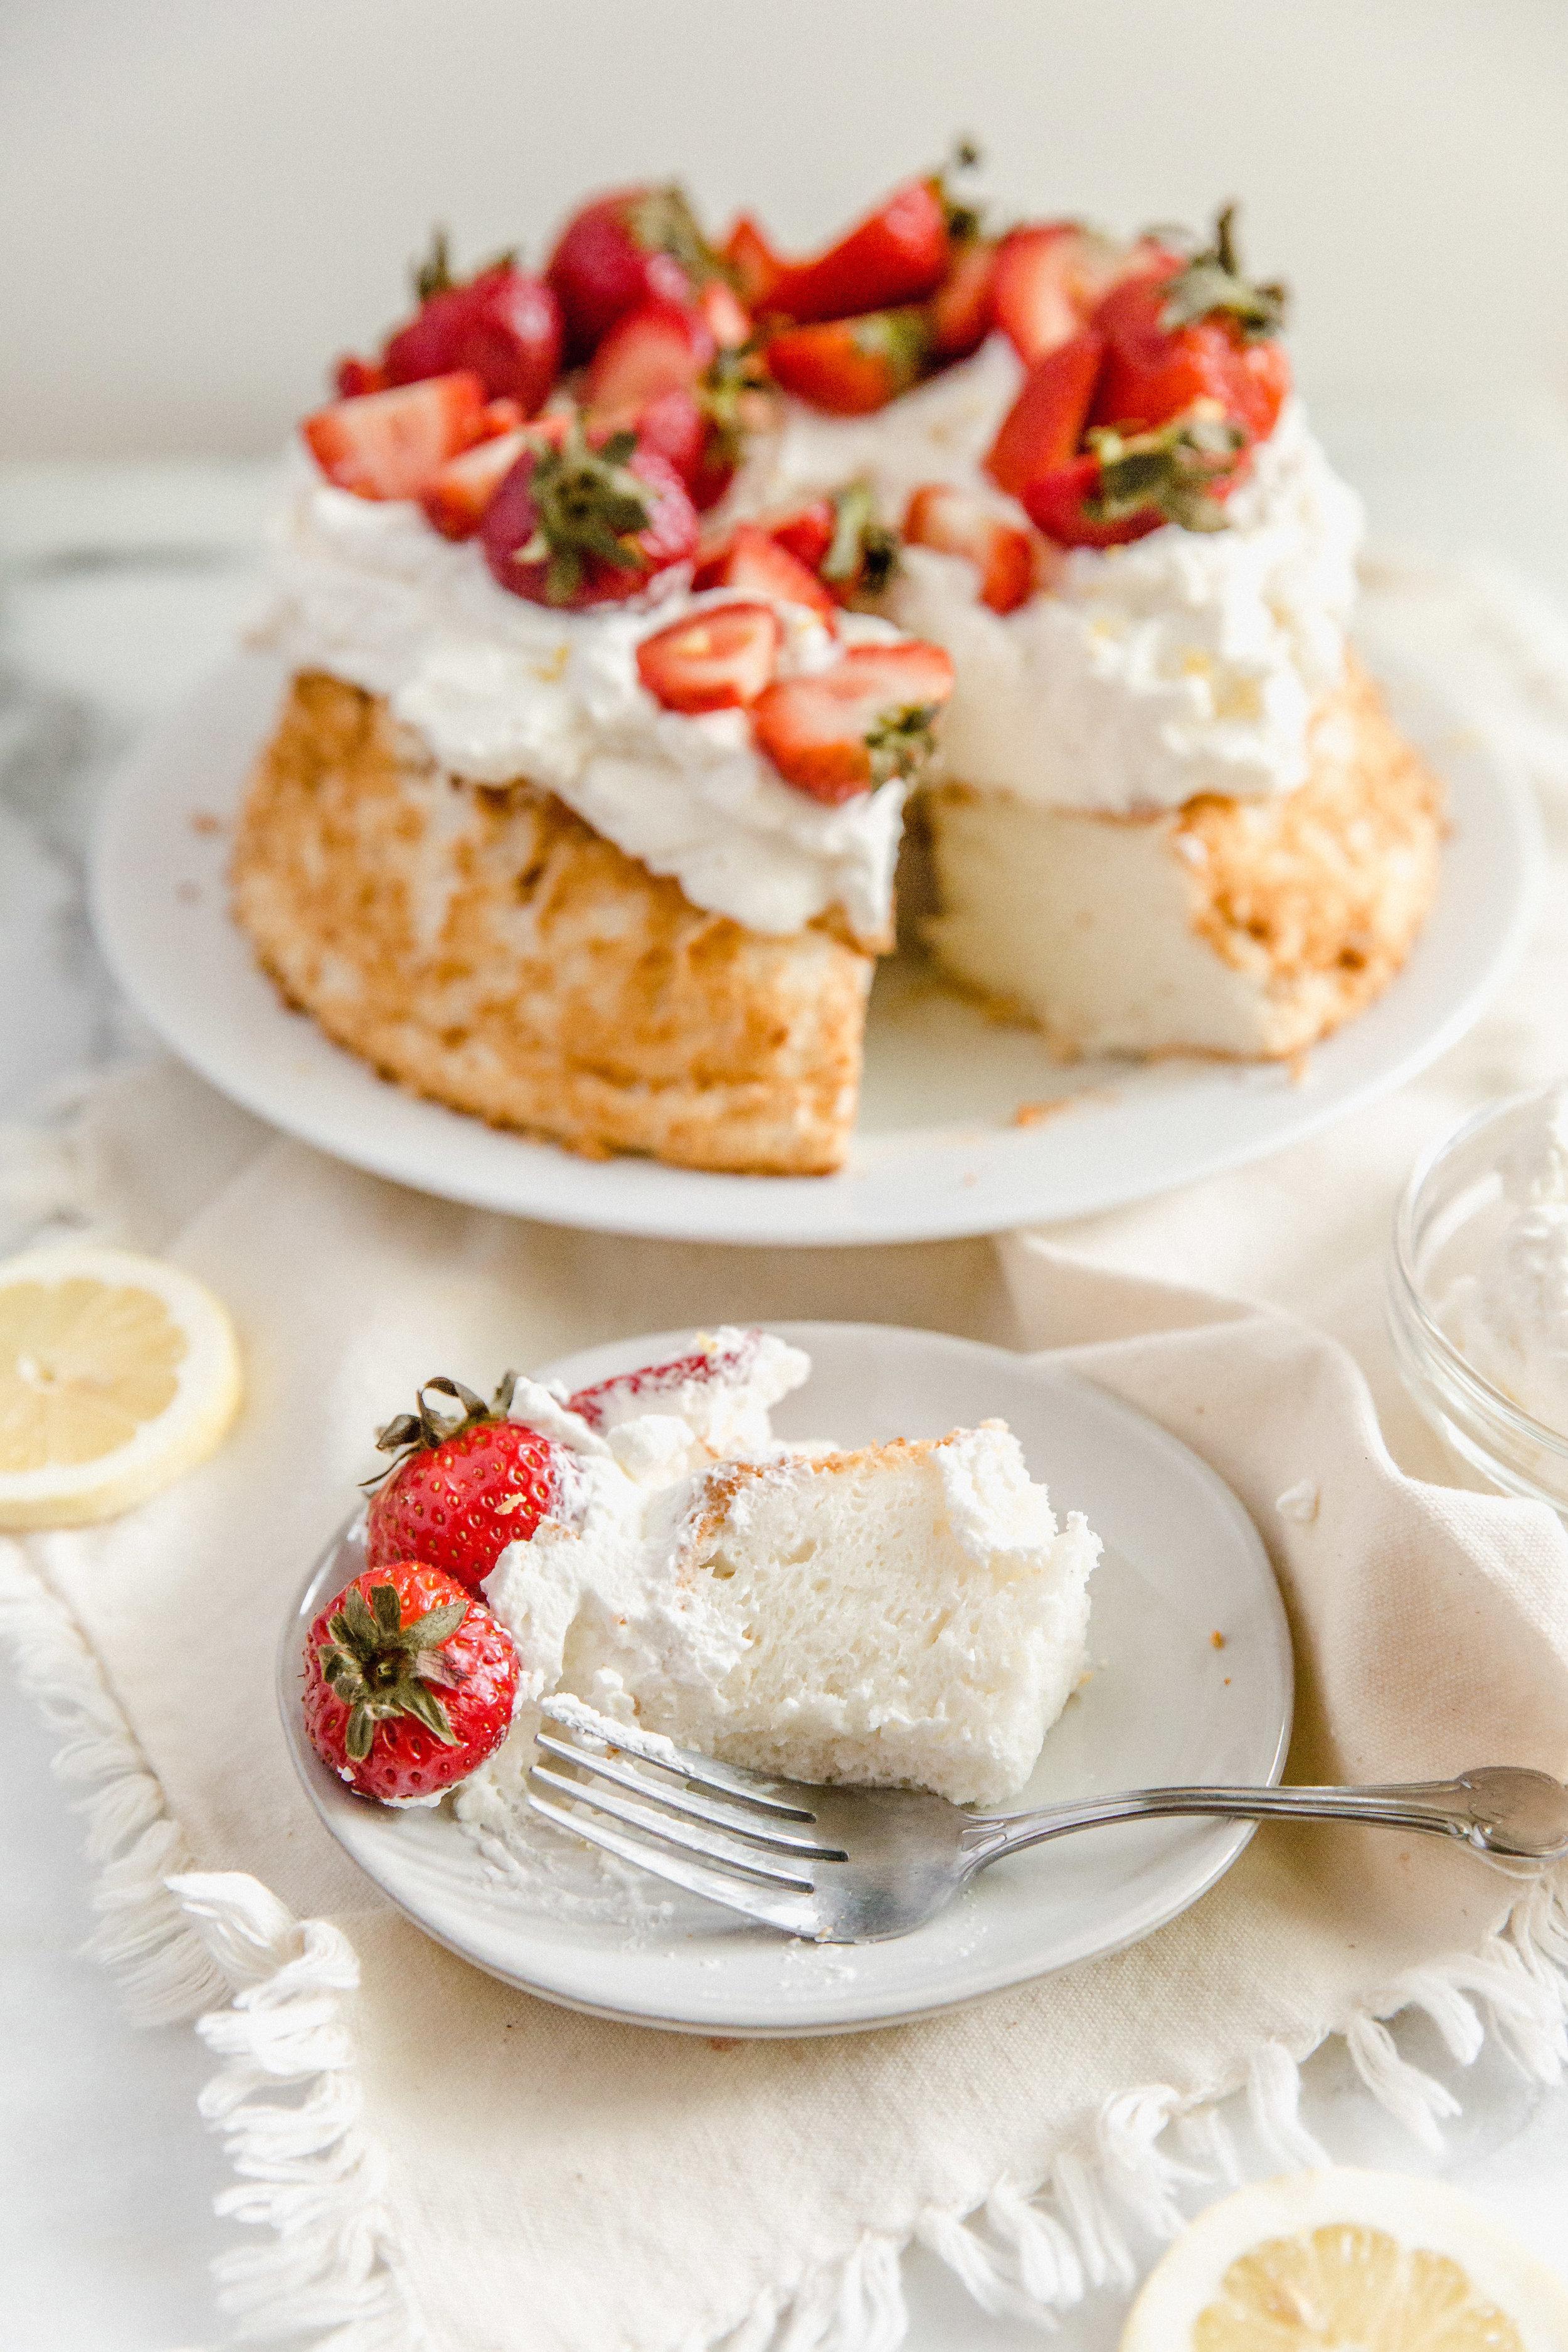 lemon-strawberry-shortcake-10.jpg